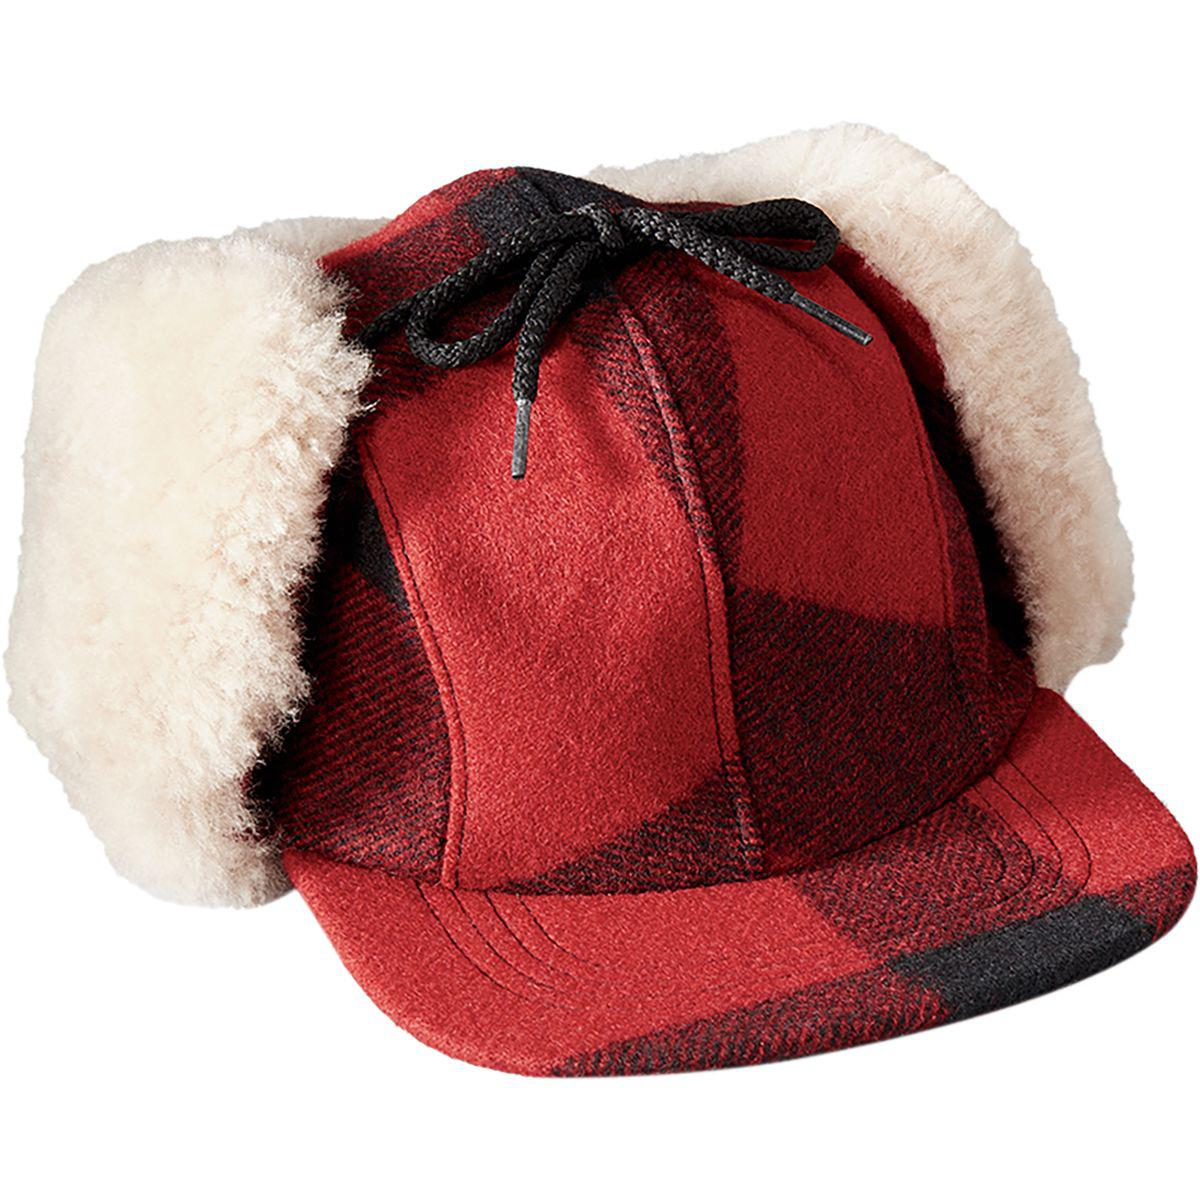 8d2b45857 Lyst - Filson Double Mackinaw Cap in Red for Men